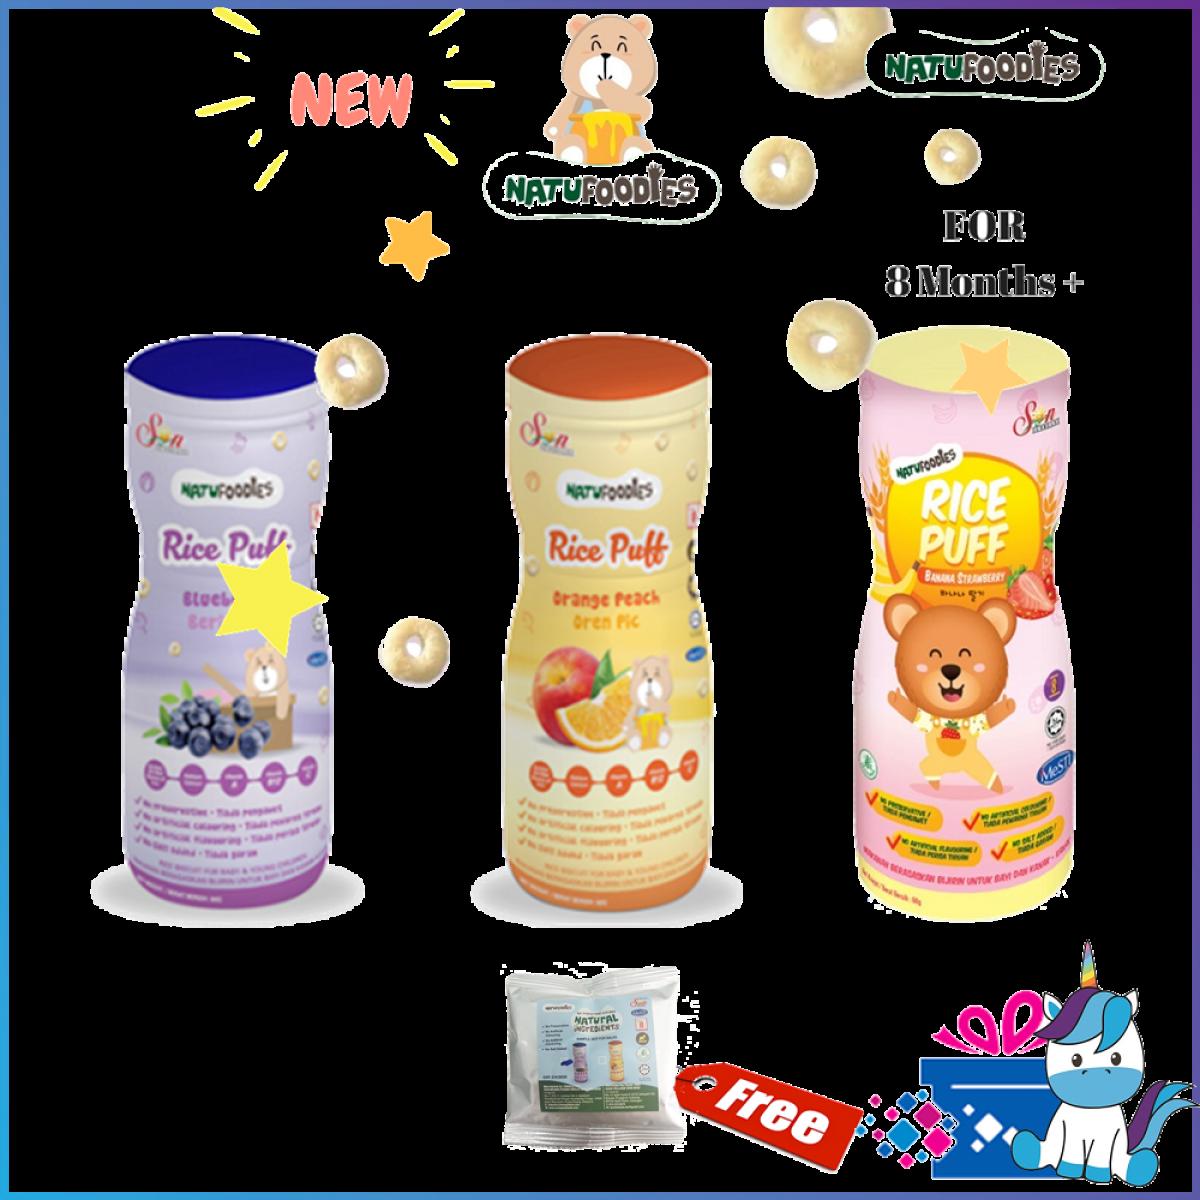 3 Bottles - Halal Natufoodies Rice Puff (60g) - Blueberry / Orange Peach / Strawberry Banana (Expiry: 08/2020)